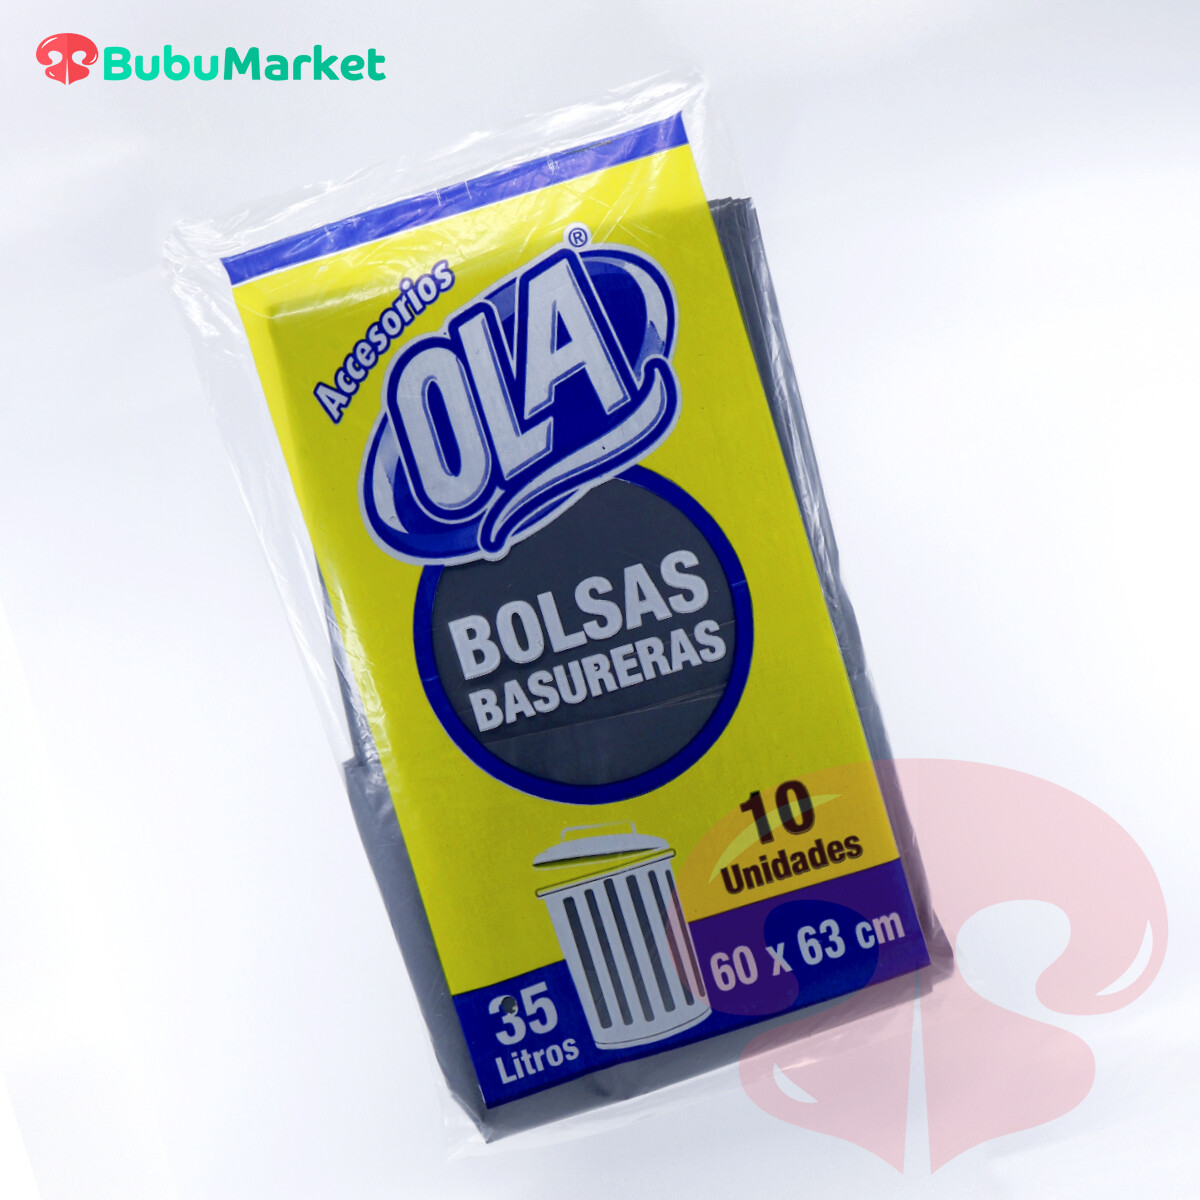 BOLSAS OLA PARA BASURA 35 LT. (60cm. x 63cm.) PAQ. DE 10 U.